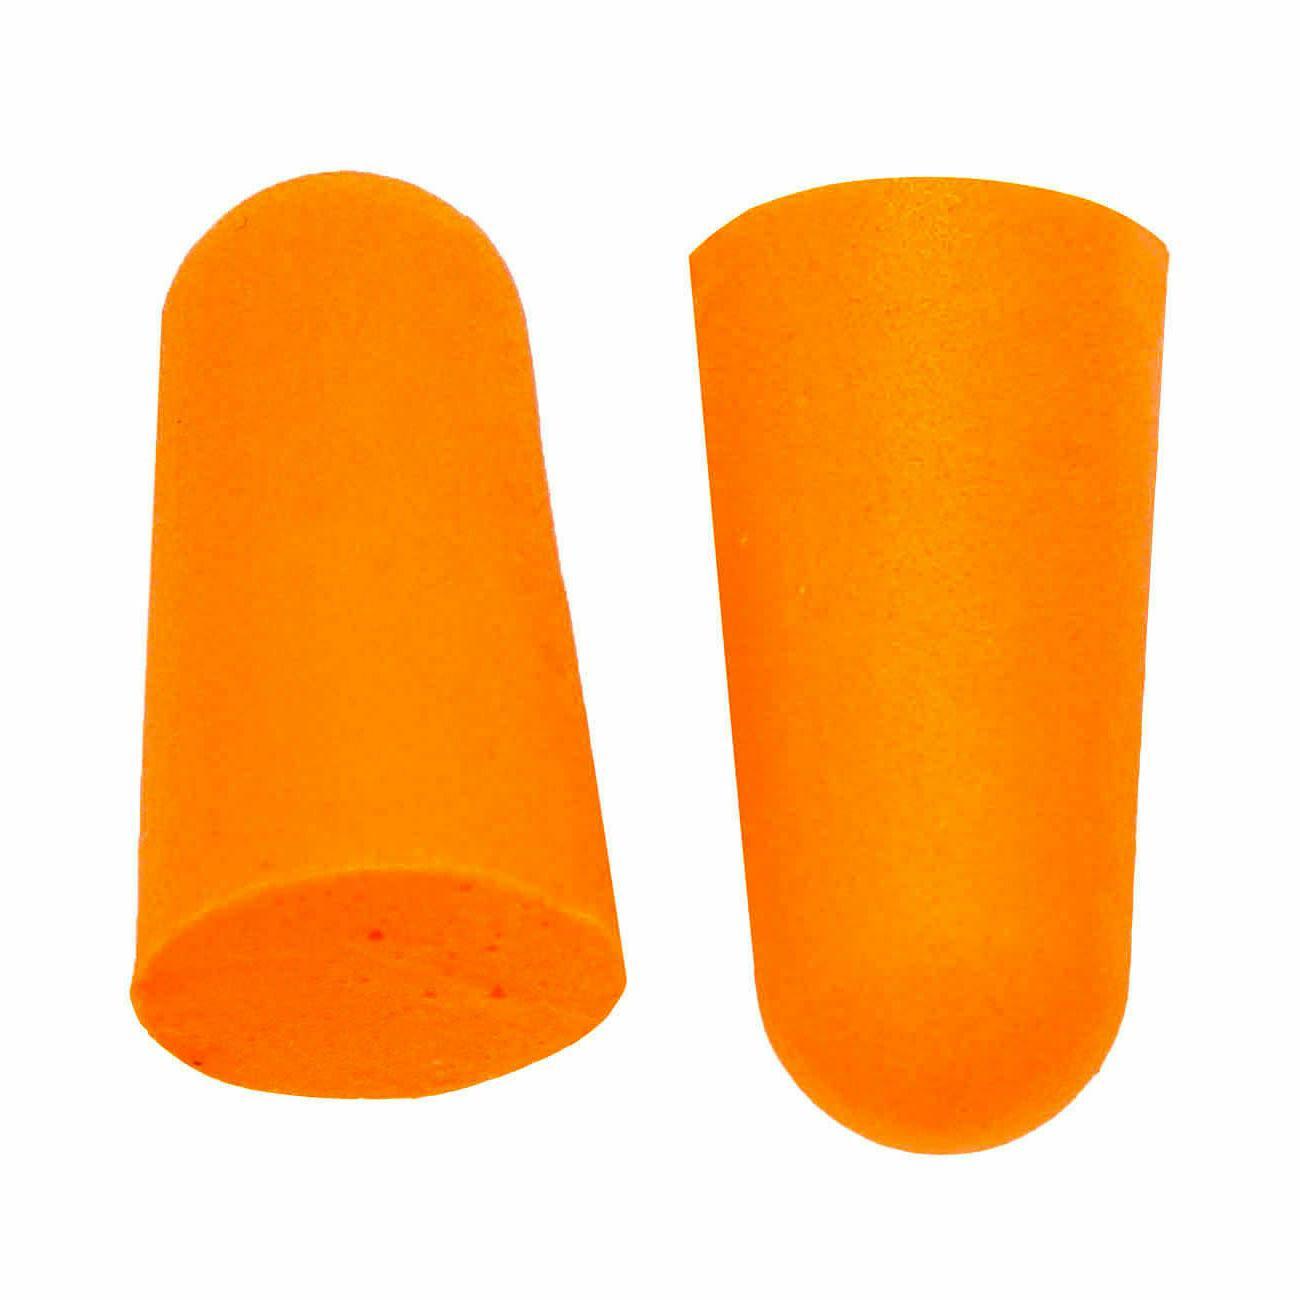 EarPlugs 50 Orange Soft Noise